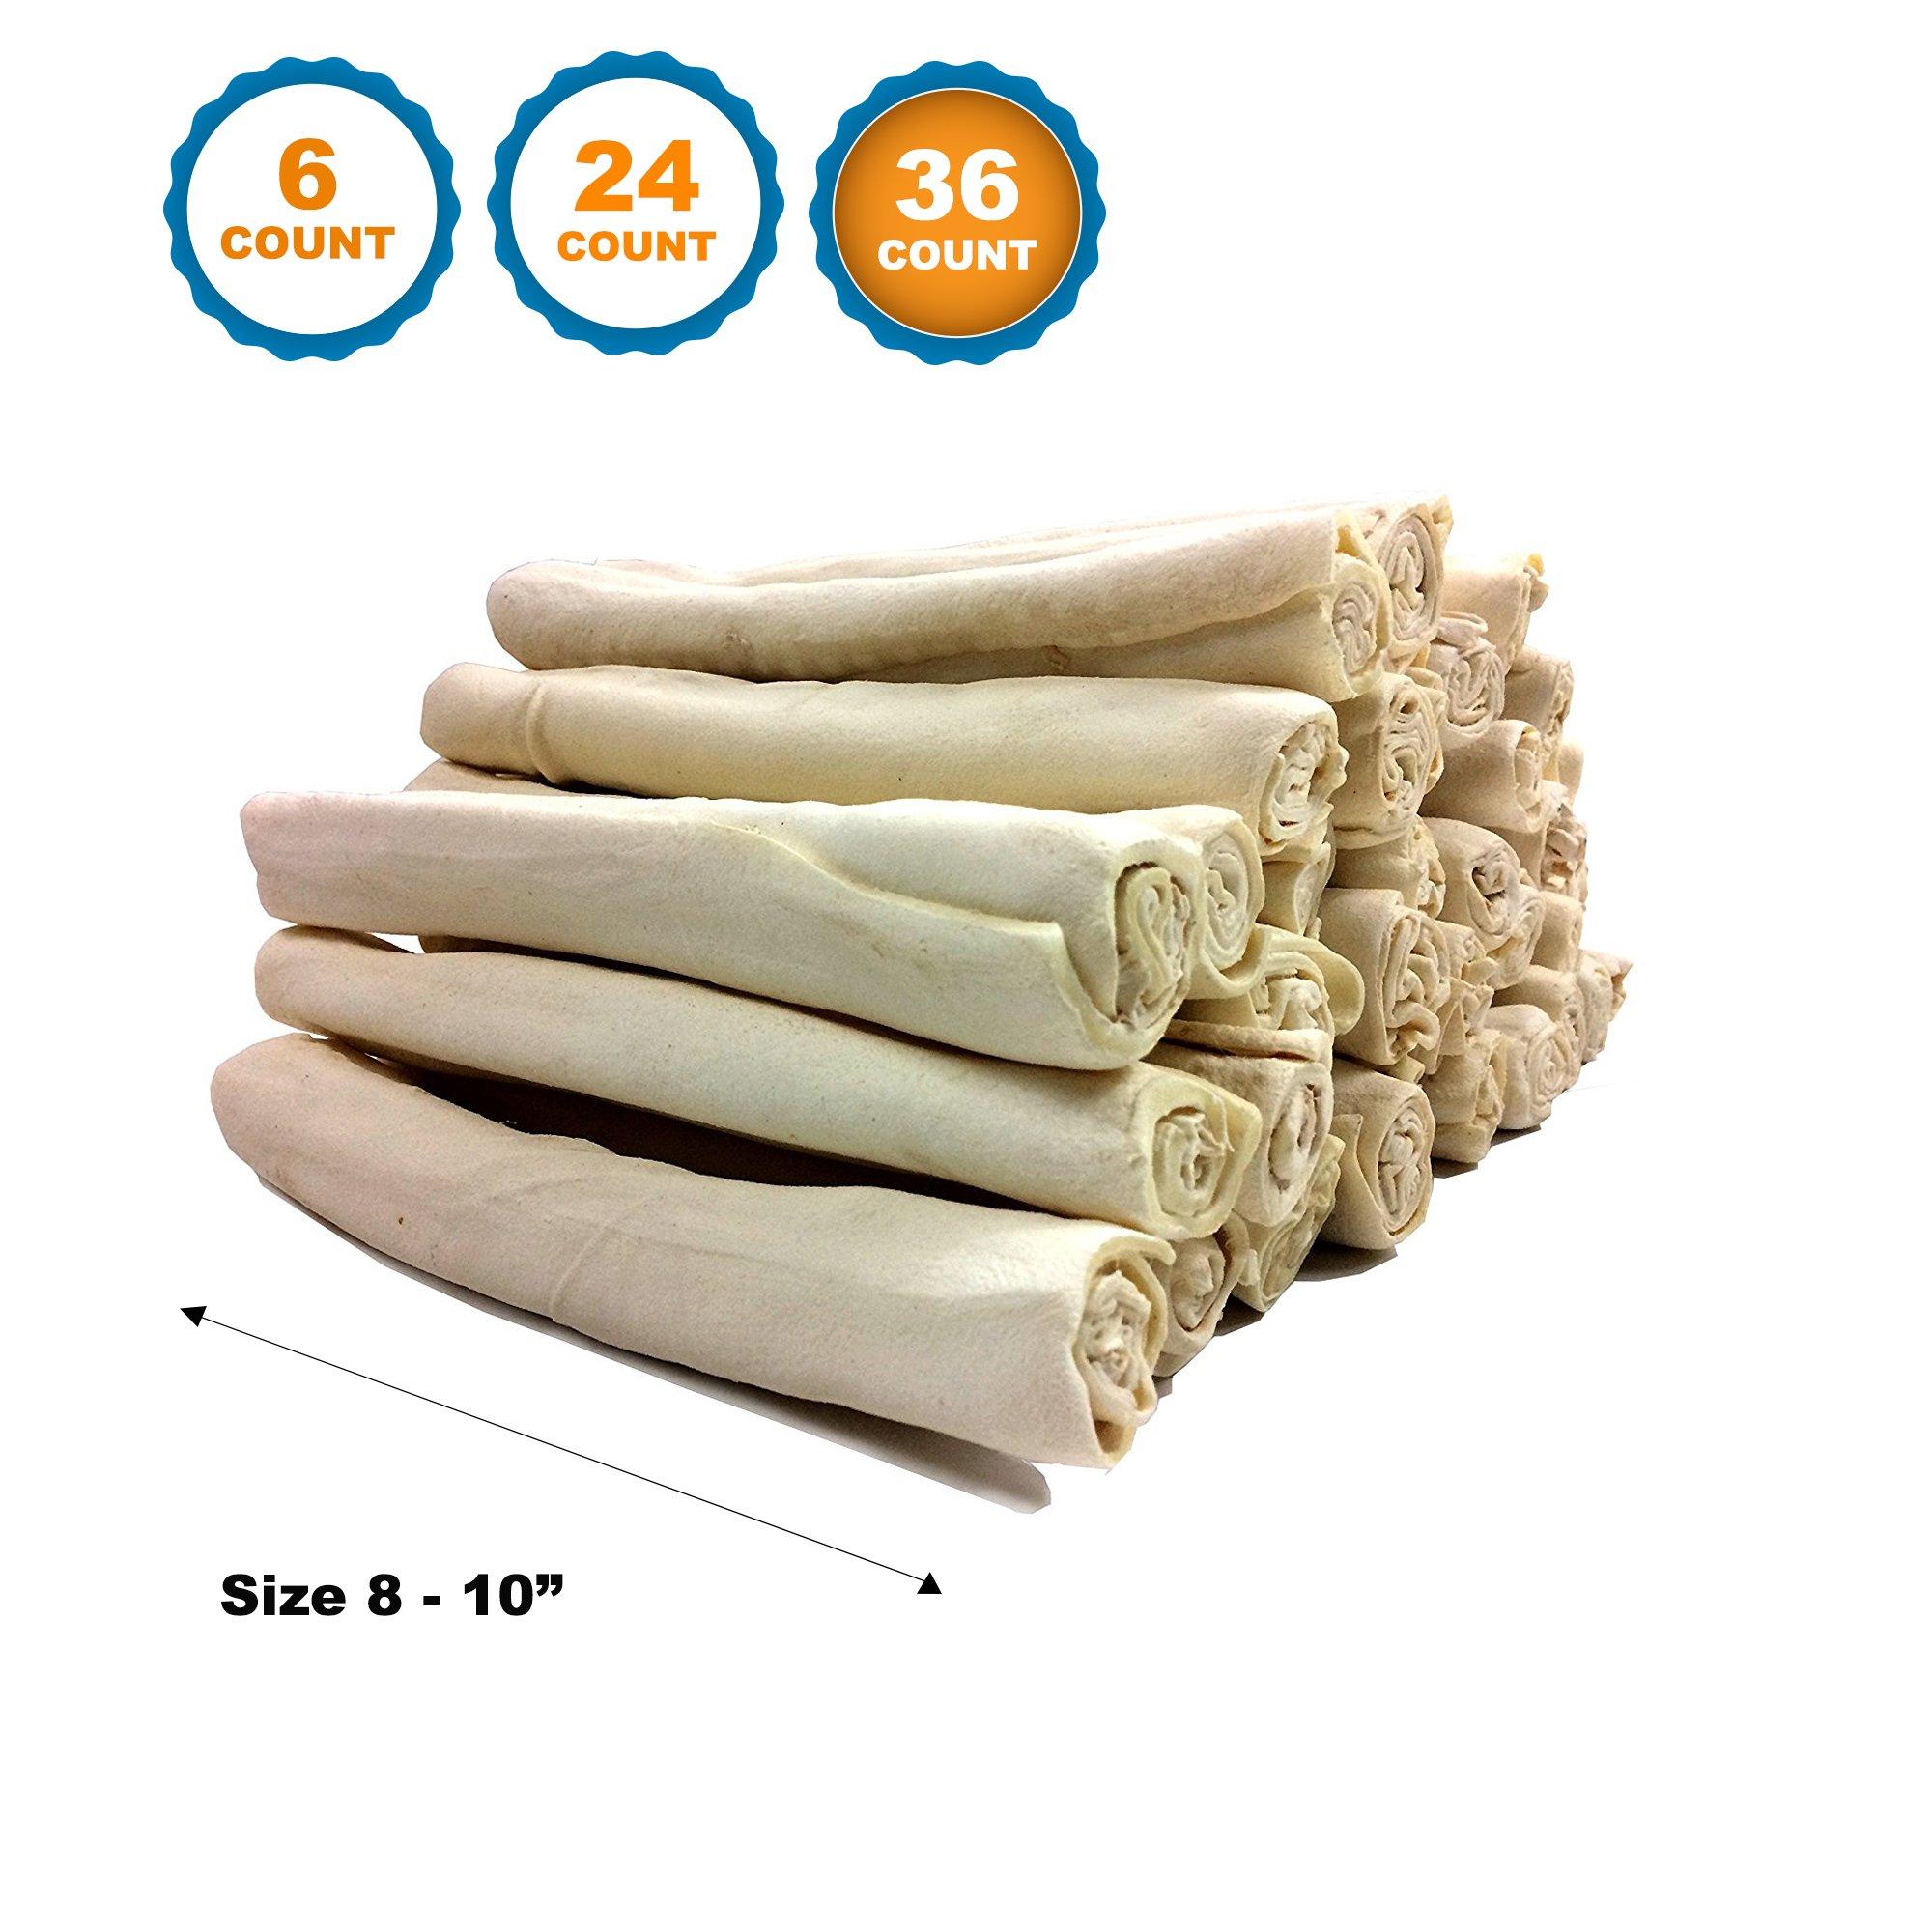 Rawhide Retriever Roll Bulk - 100% Natural Rawhide Roll Dog Treats (8-10 Inches, 36 Count)